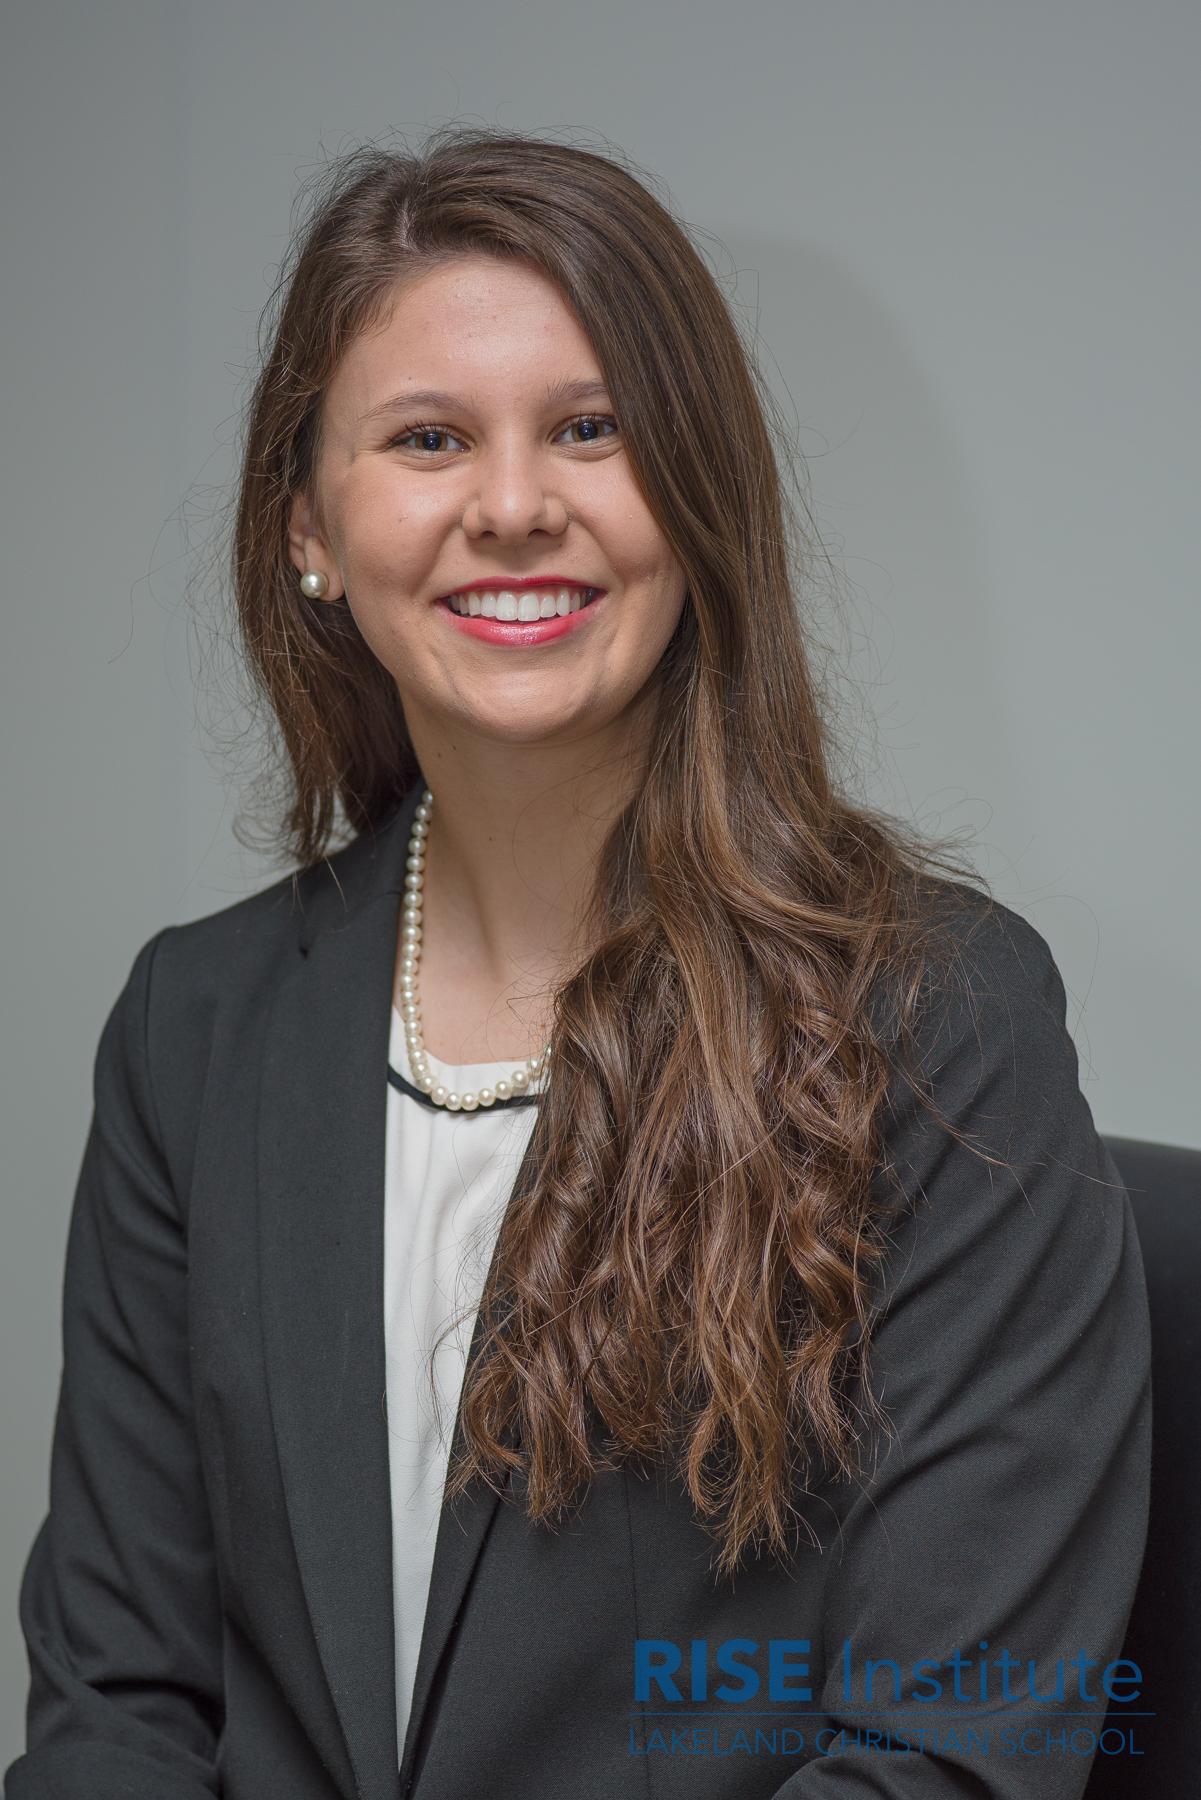 Abby Branham - From Classroom to Courtroom program